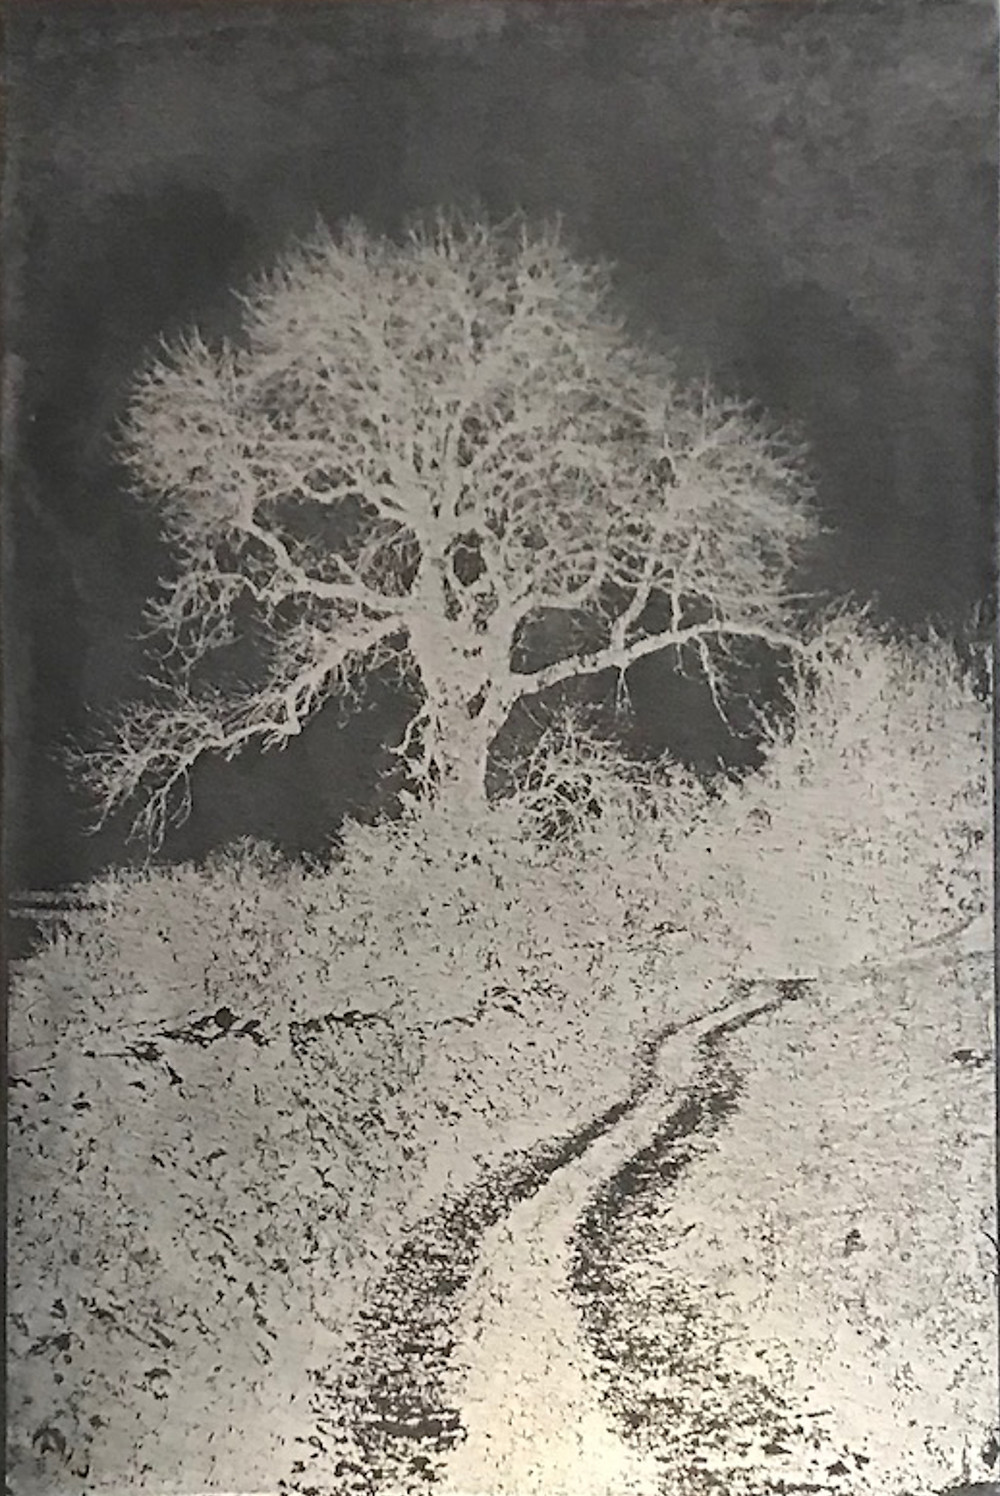 etched-plate-wharfdaletree_jan2019-7994